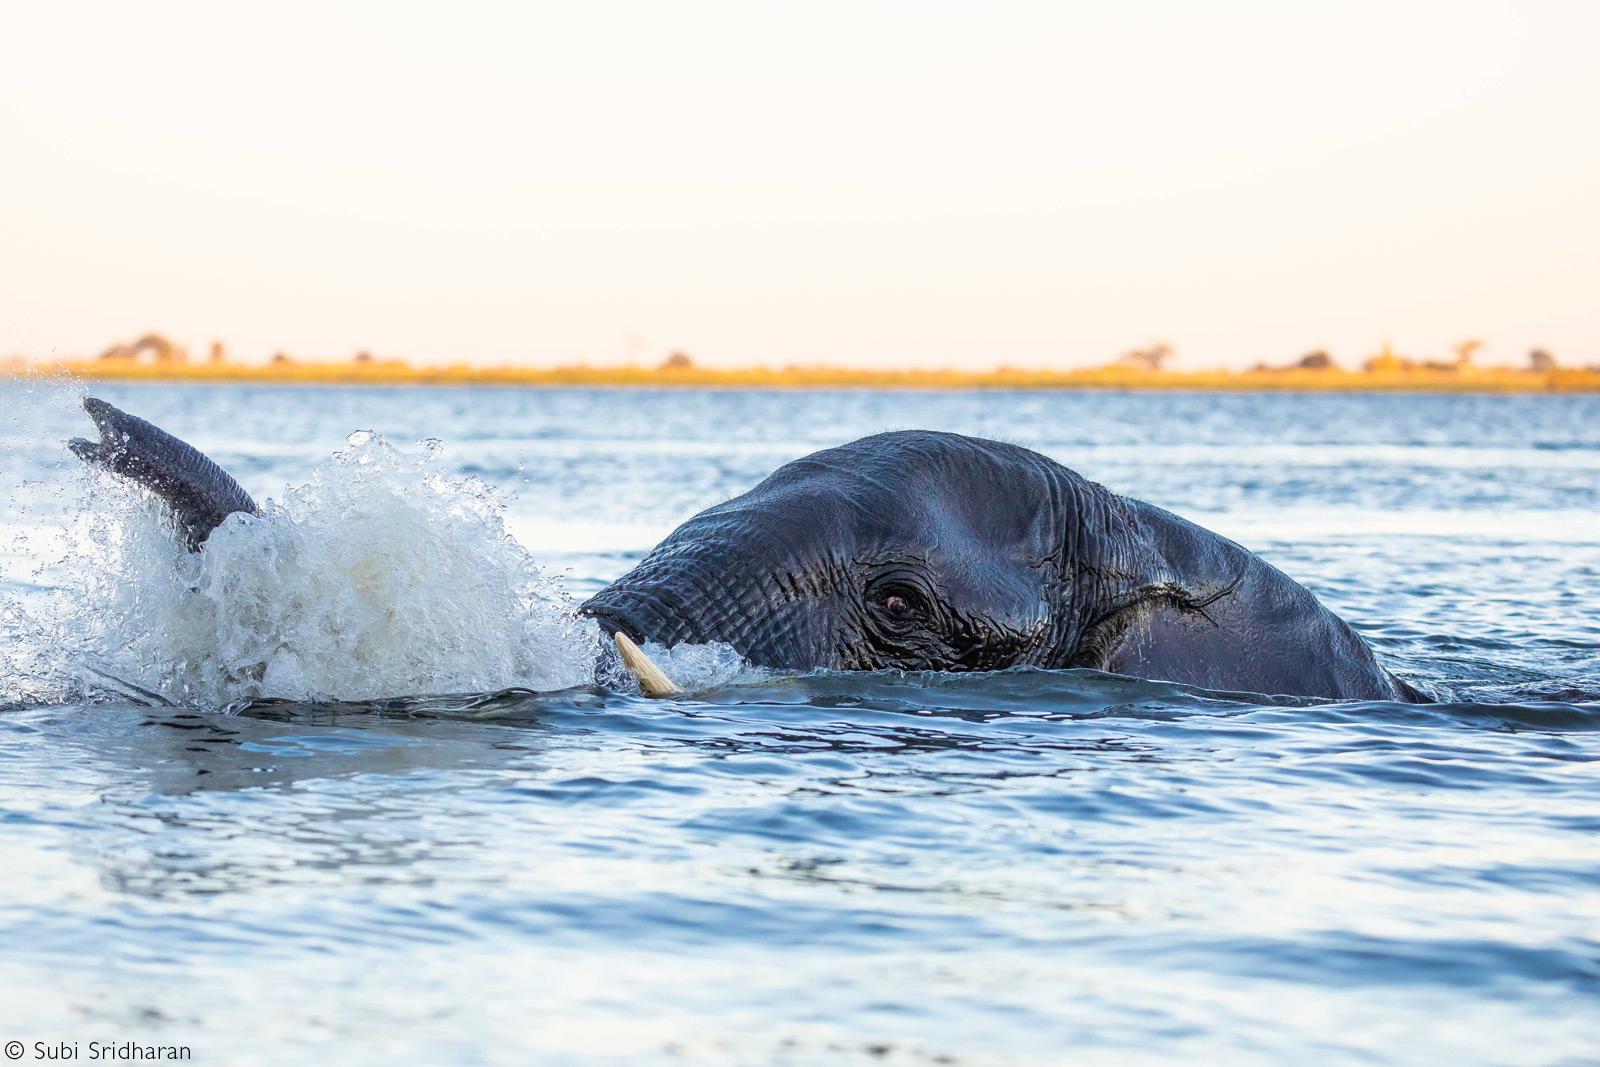 An elephant takes a swim. Chobe National Park, Botswana © Subi Sridharan